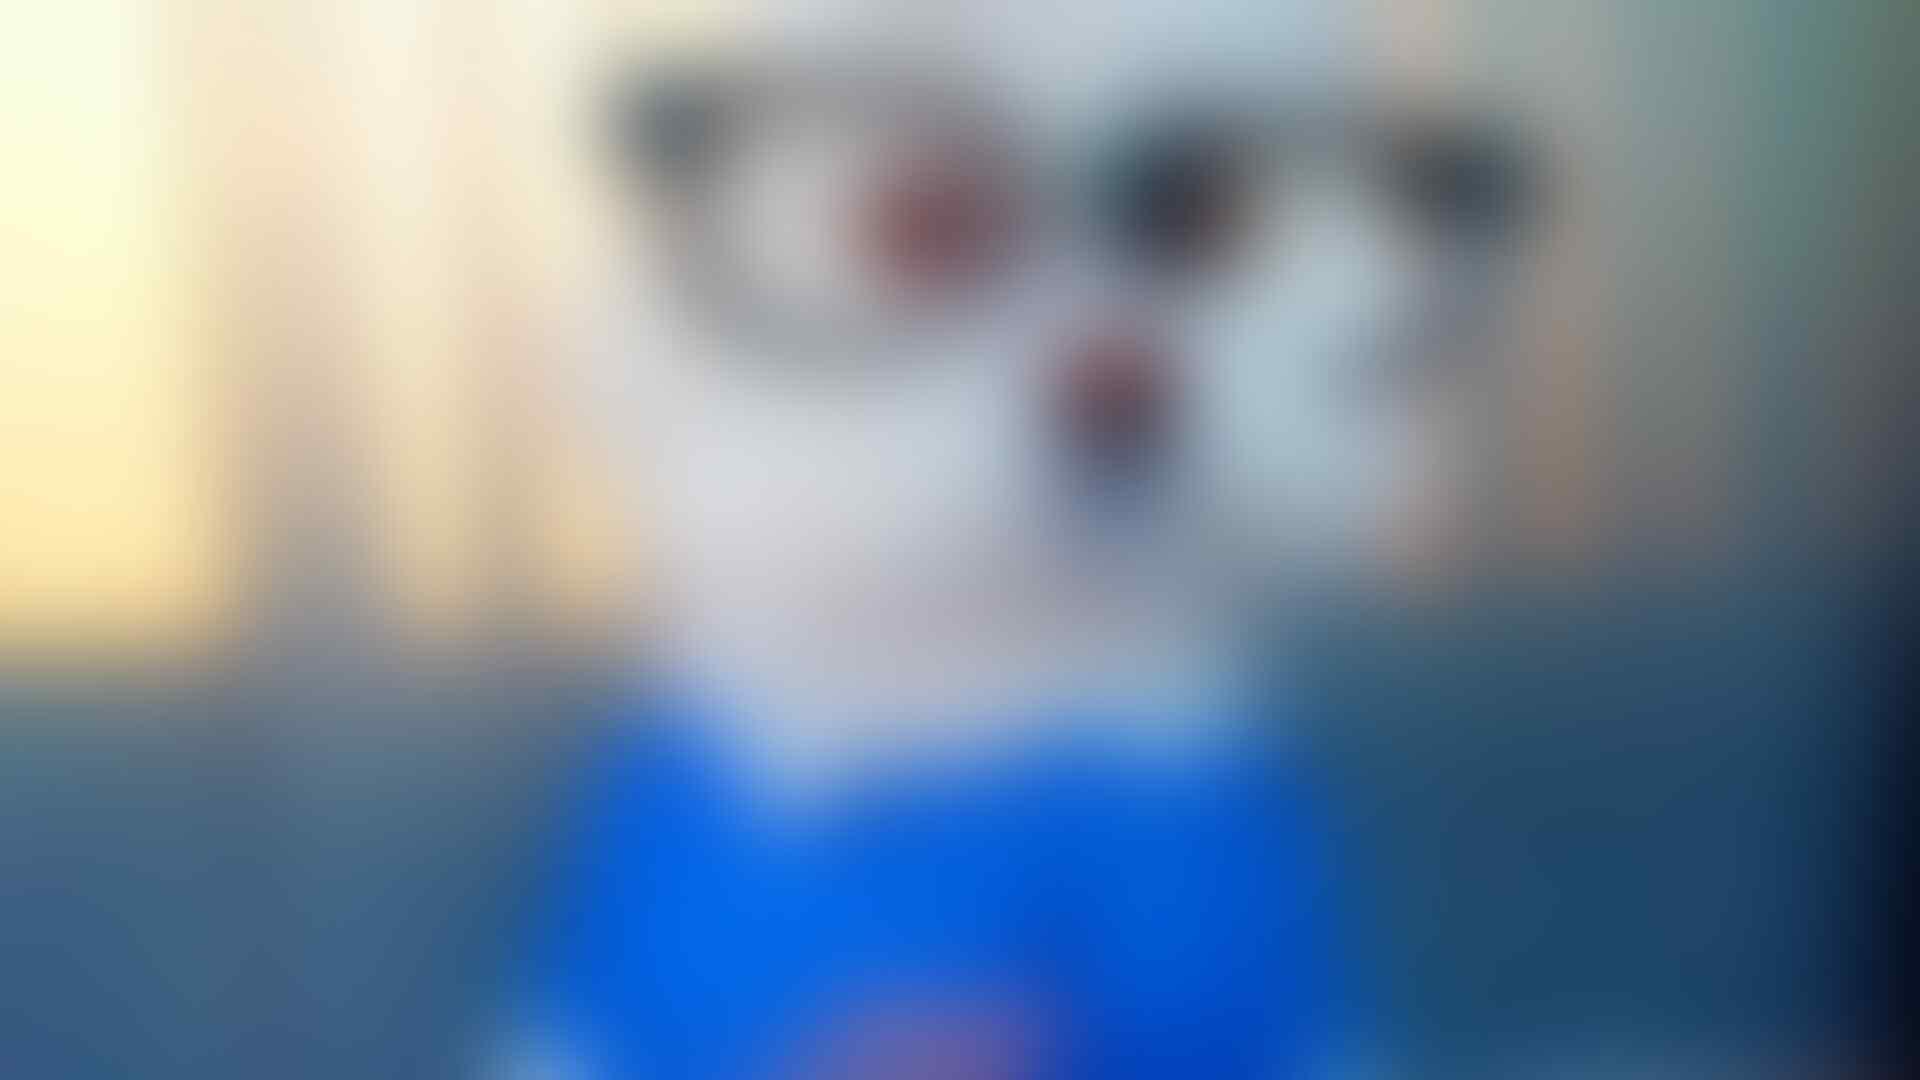 6 Hal Penting tentang Kacamata Minus yang Ternyata Cuma Mitos